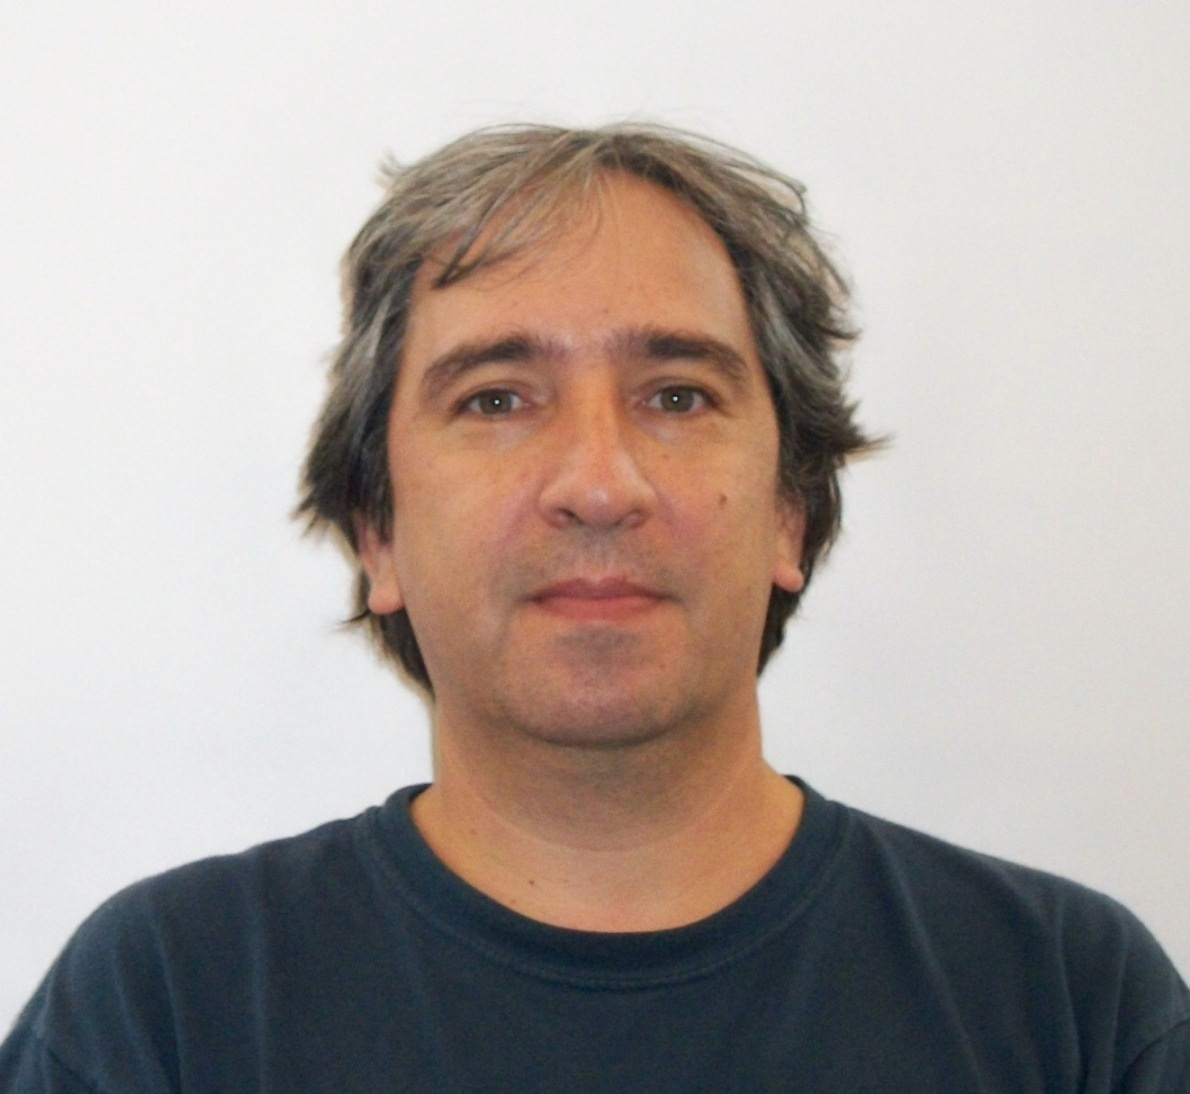 Carlos A Gonzalez-Benecke